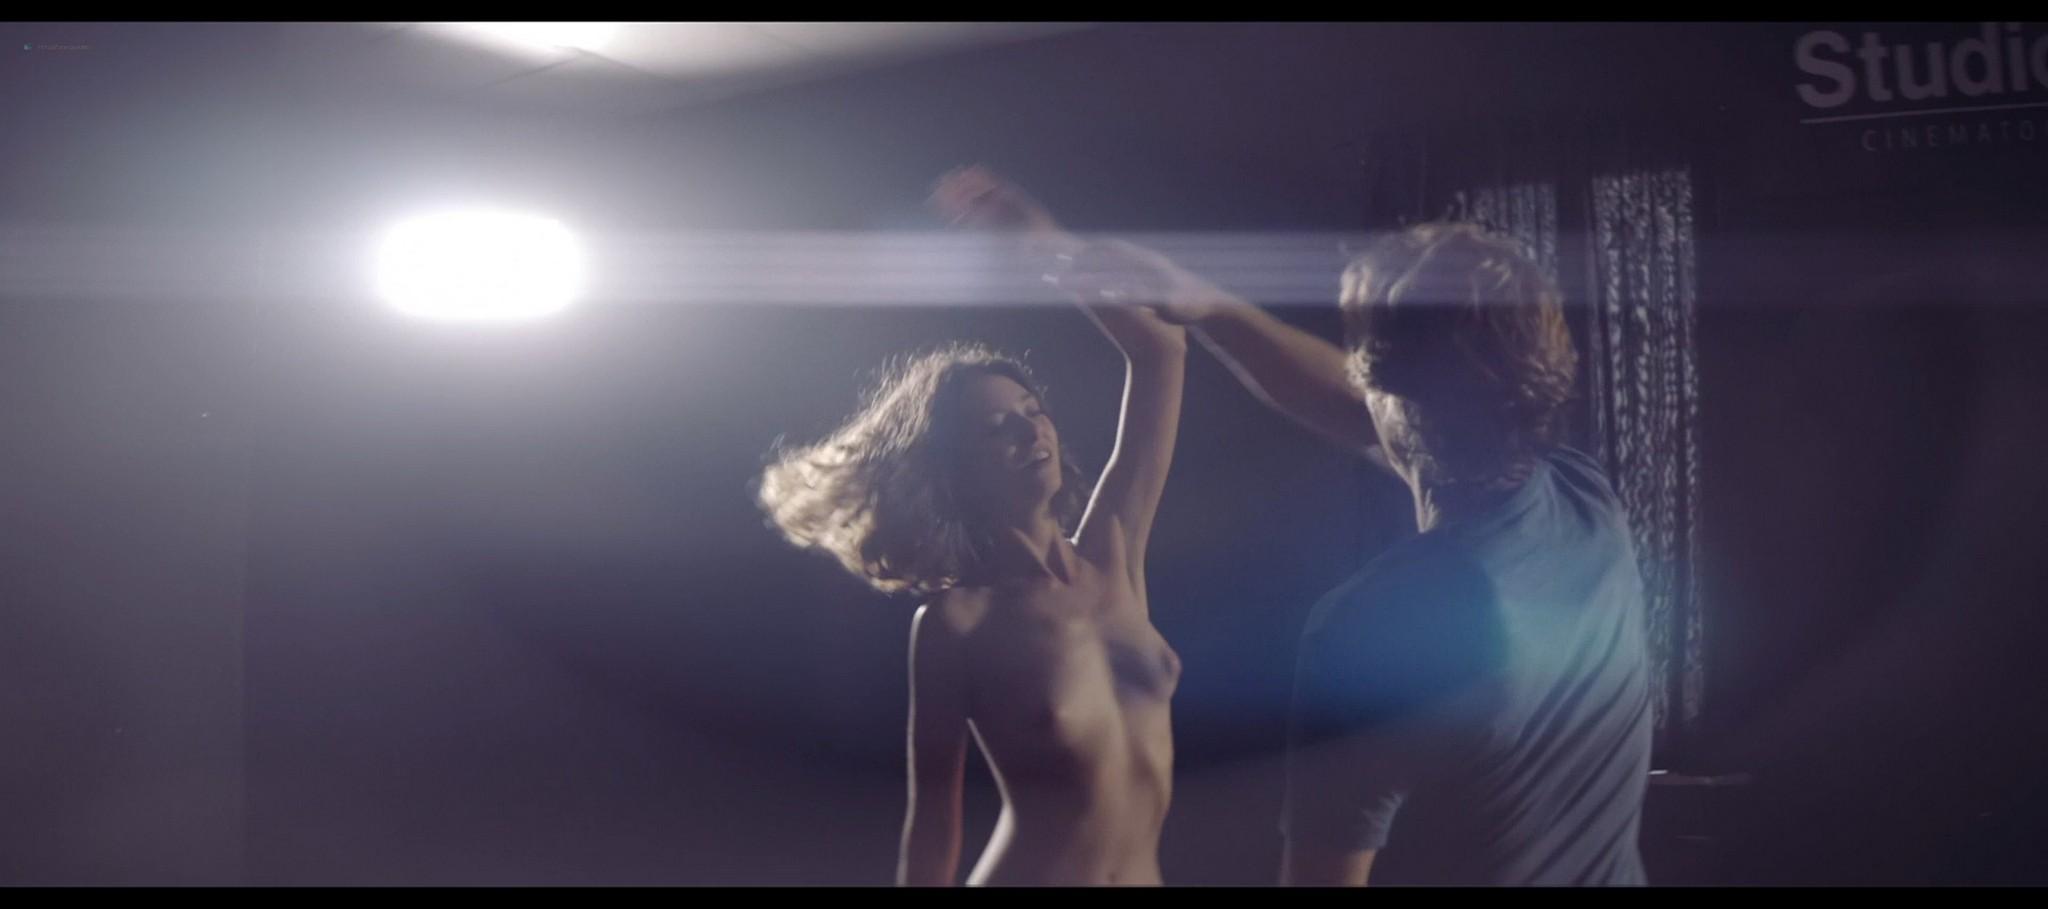 Cristina Chiriac nude full frontal Sofia Rania Dharma Mangia Woods full frontal too Tommaso 2019 HD 1080p Bluray 008